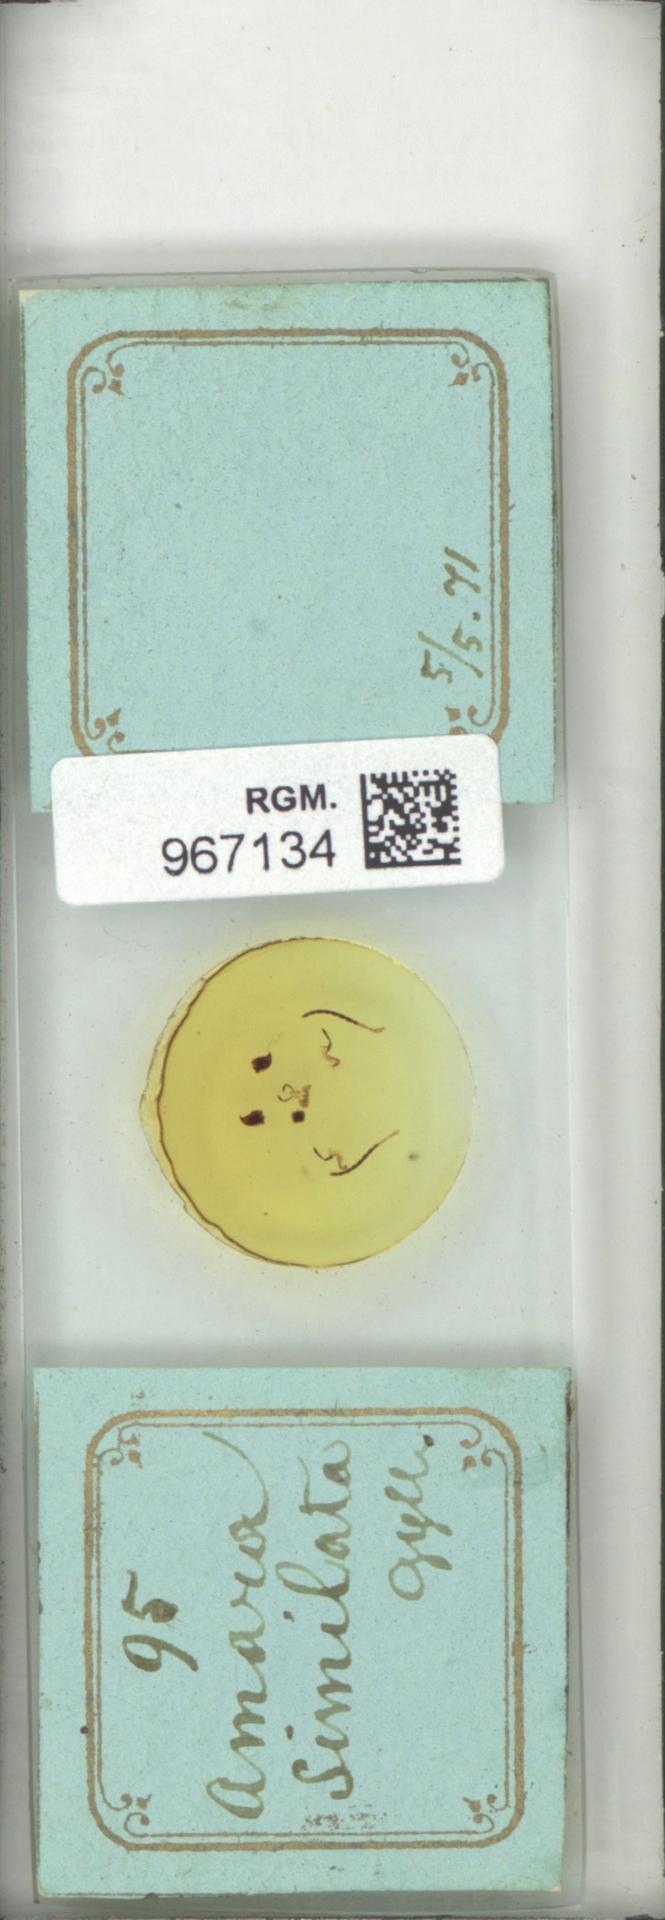 RGM.967134 | Amara similata